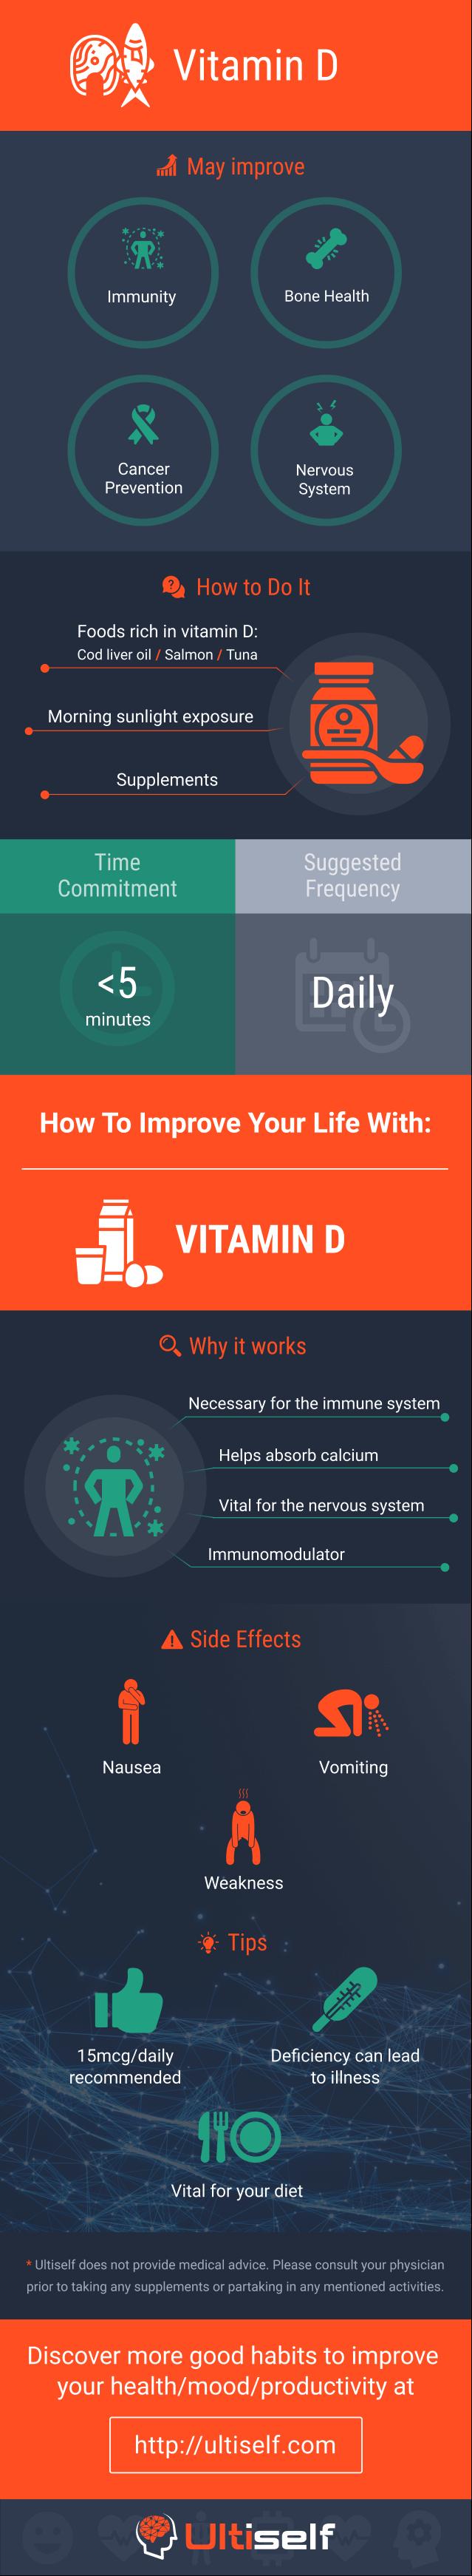 Vitamin D infographic